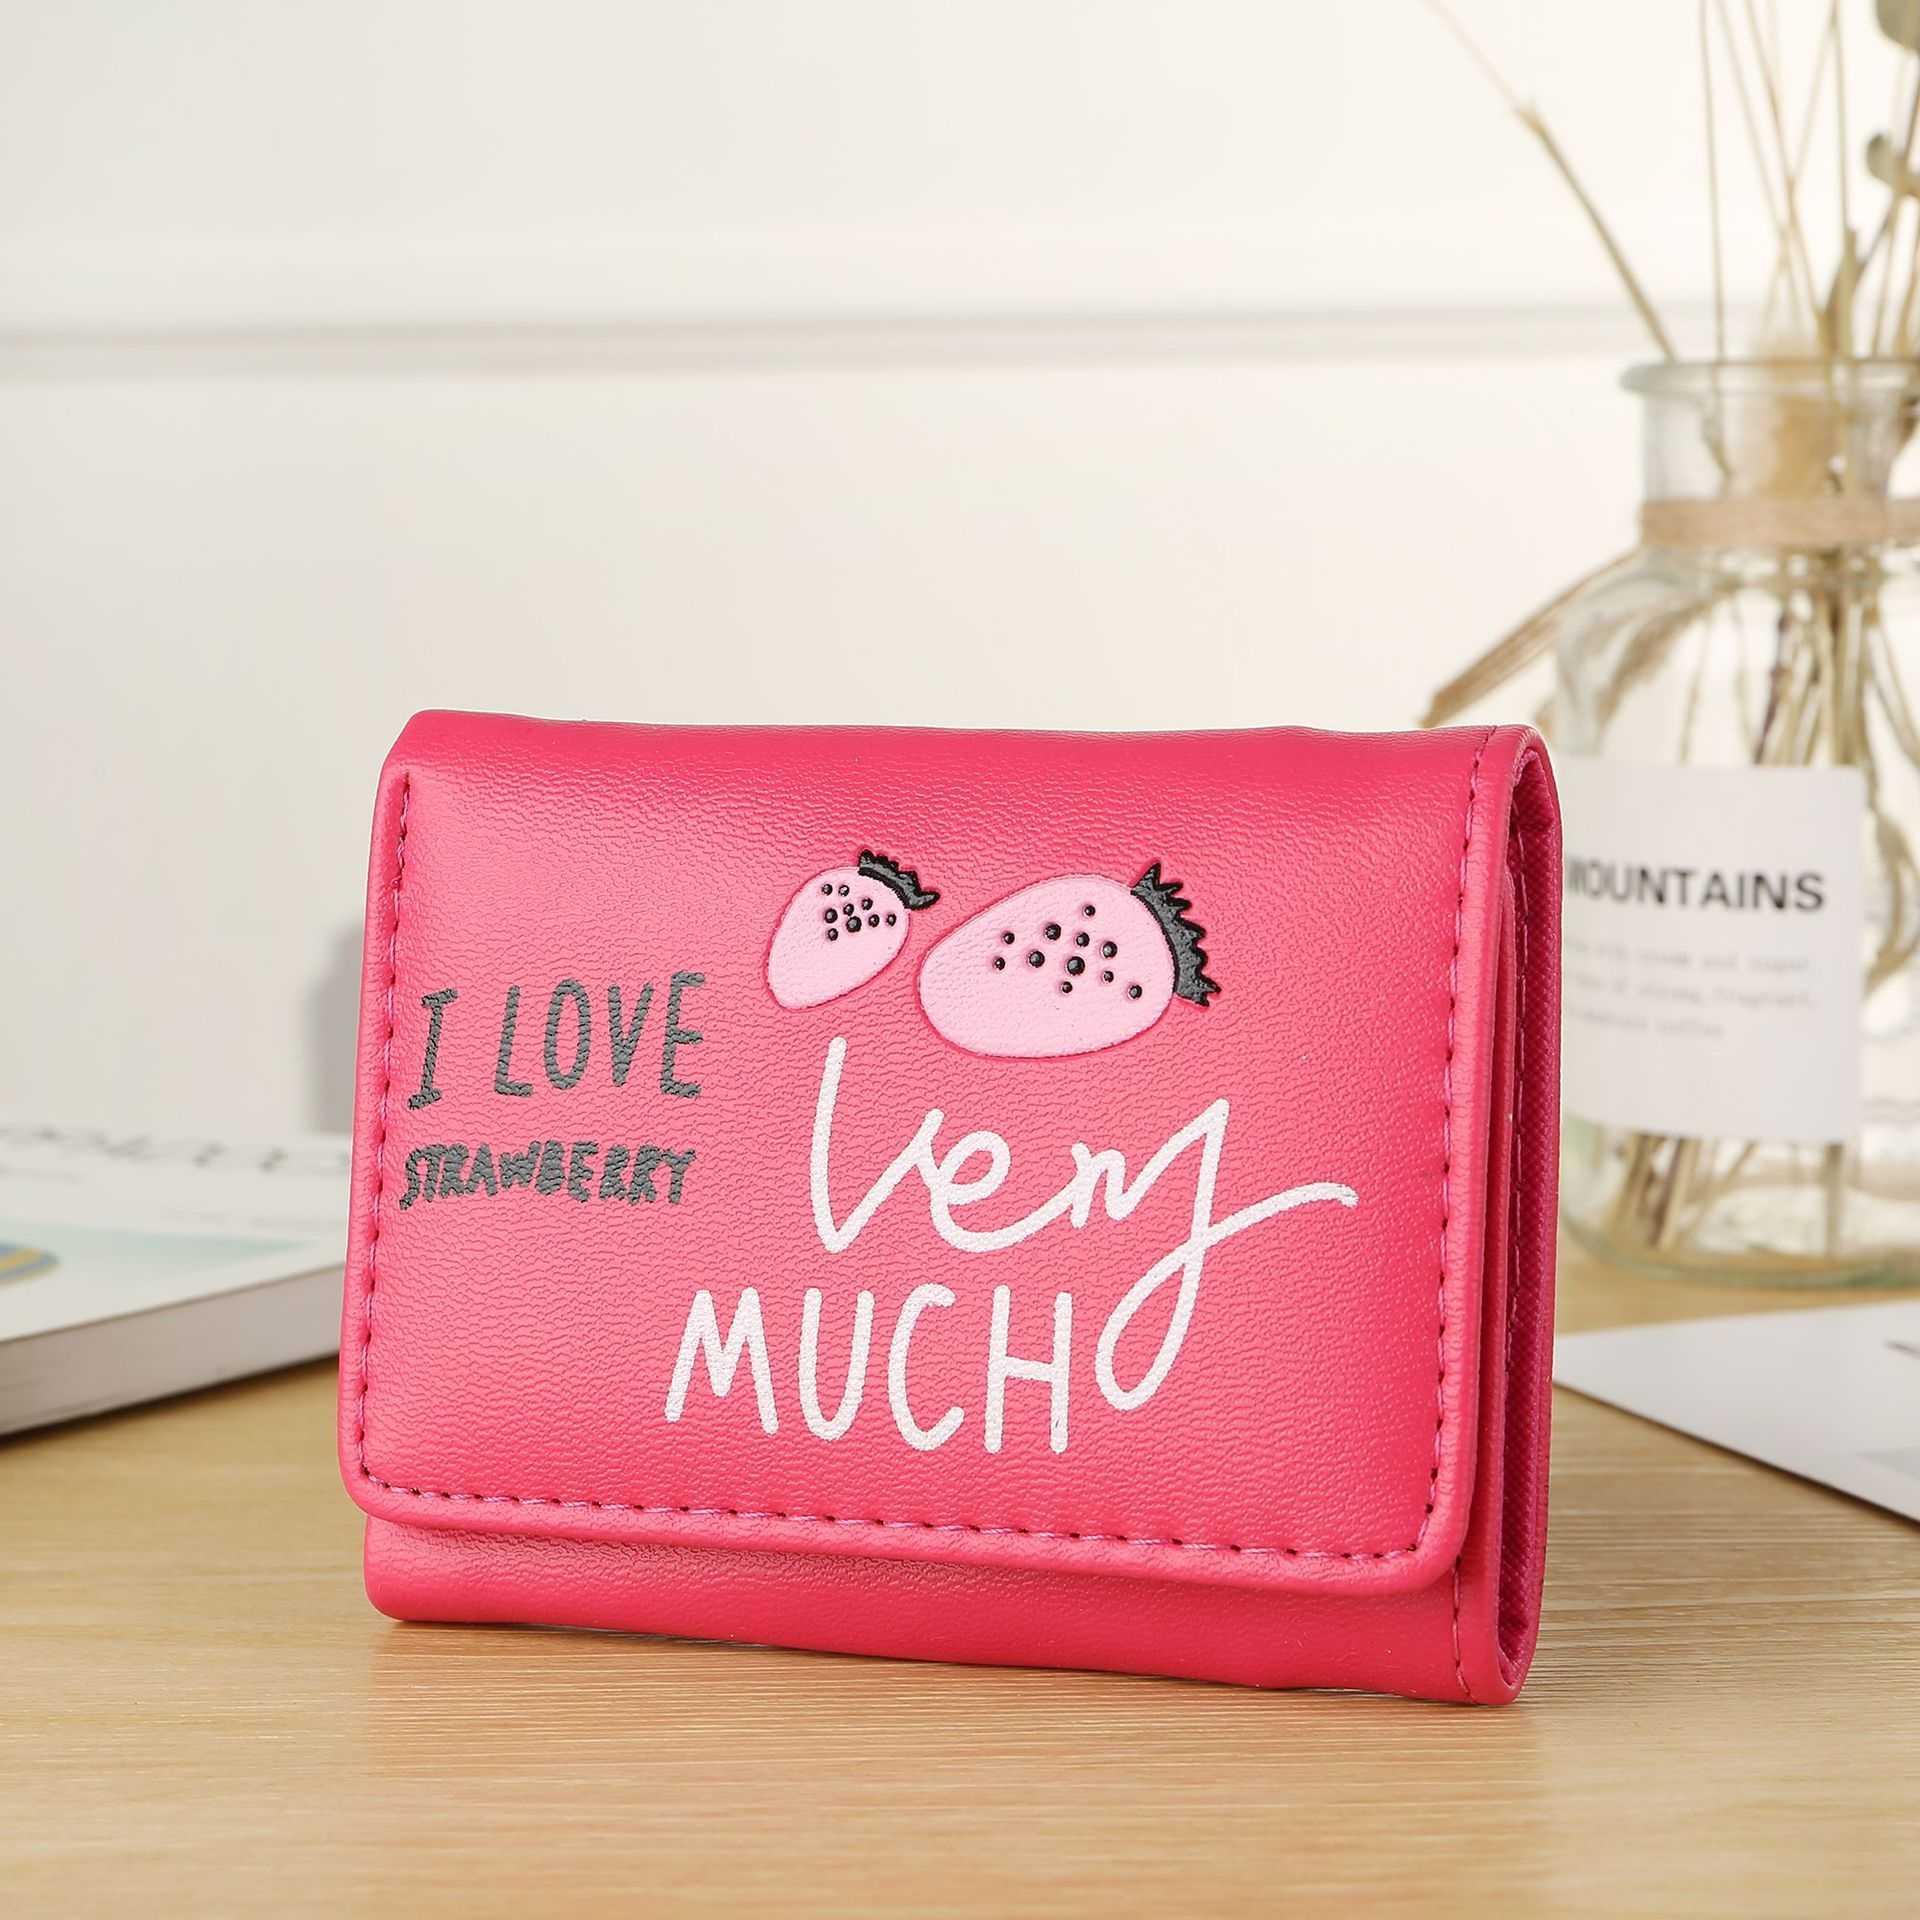 df2f14531cd8 Cartoon Short Wallet Letter Embossed Tri-Fold Wallet Card Wrapper Student  Change Small Wallet Trend Wallet